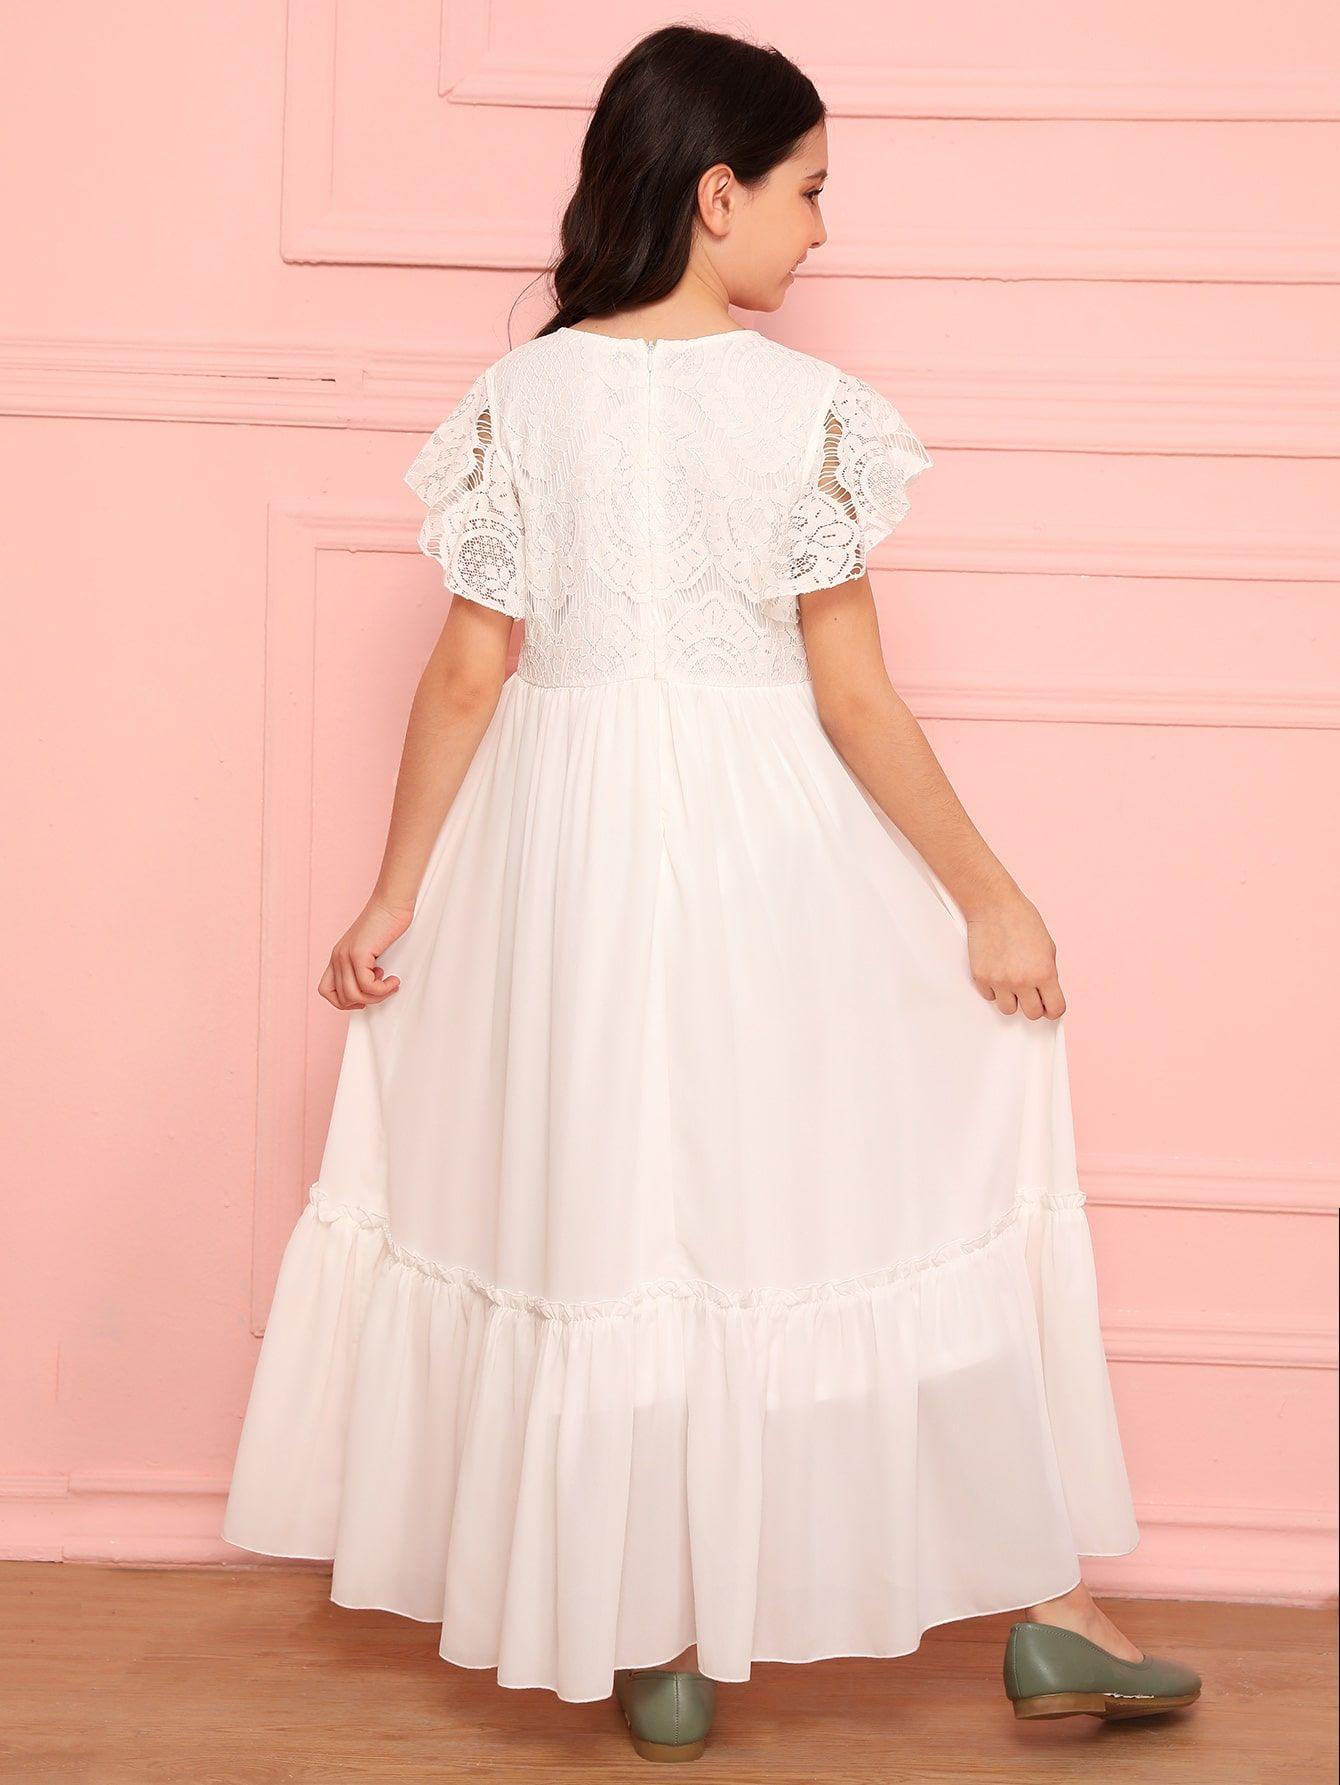 Girls Butterfly Sleeve Lace Bodice Dress Sponsored , Ad